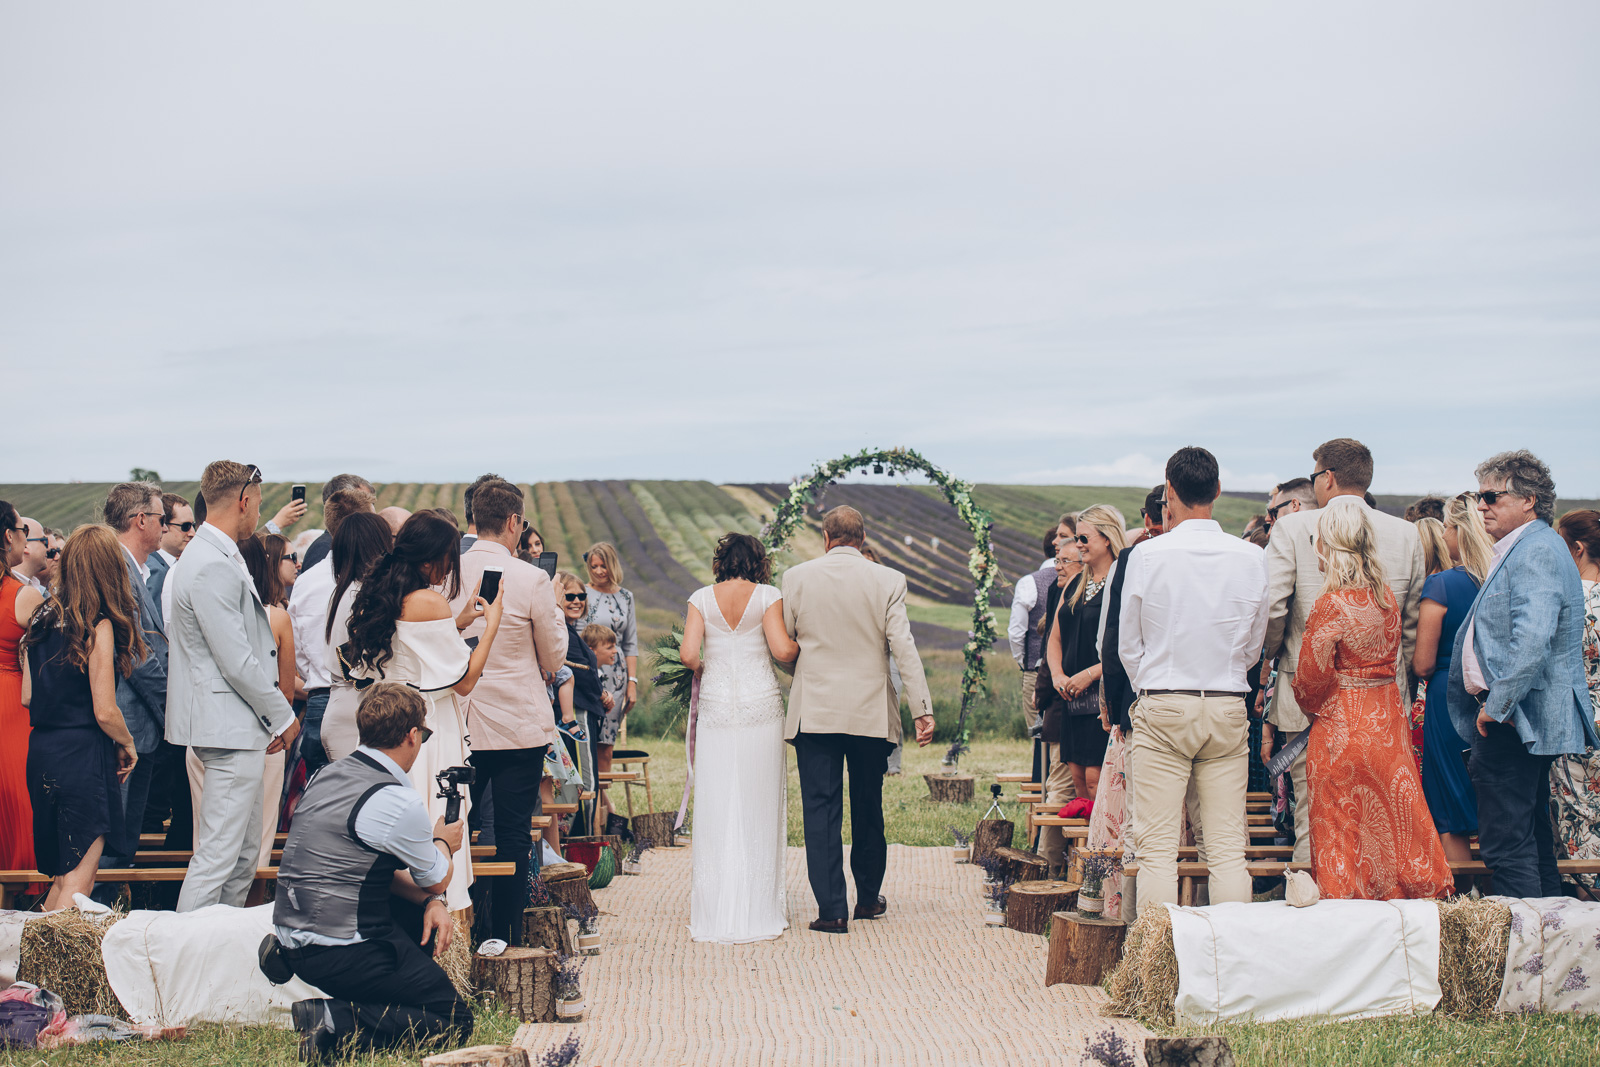 017 Wedding Photographer Hitchin © Erica Hawkins Photography